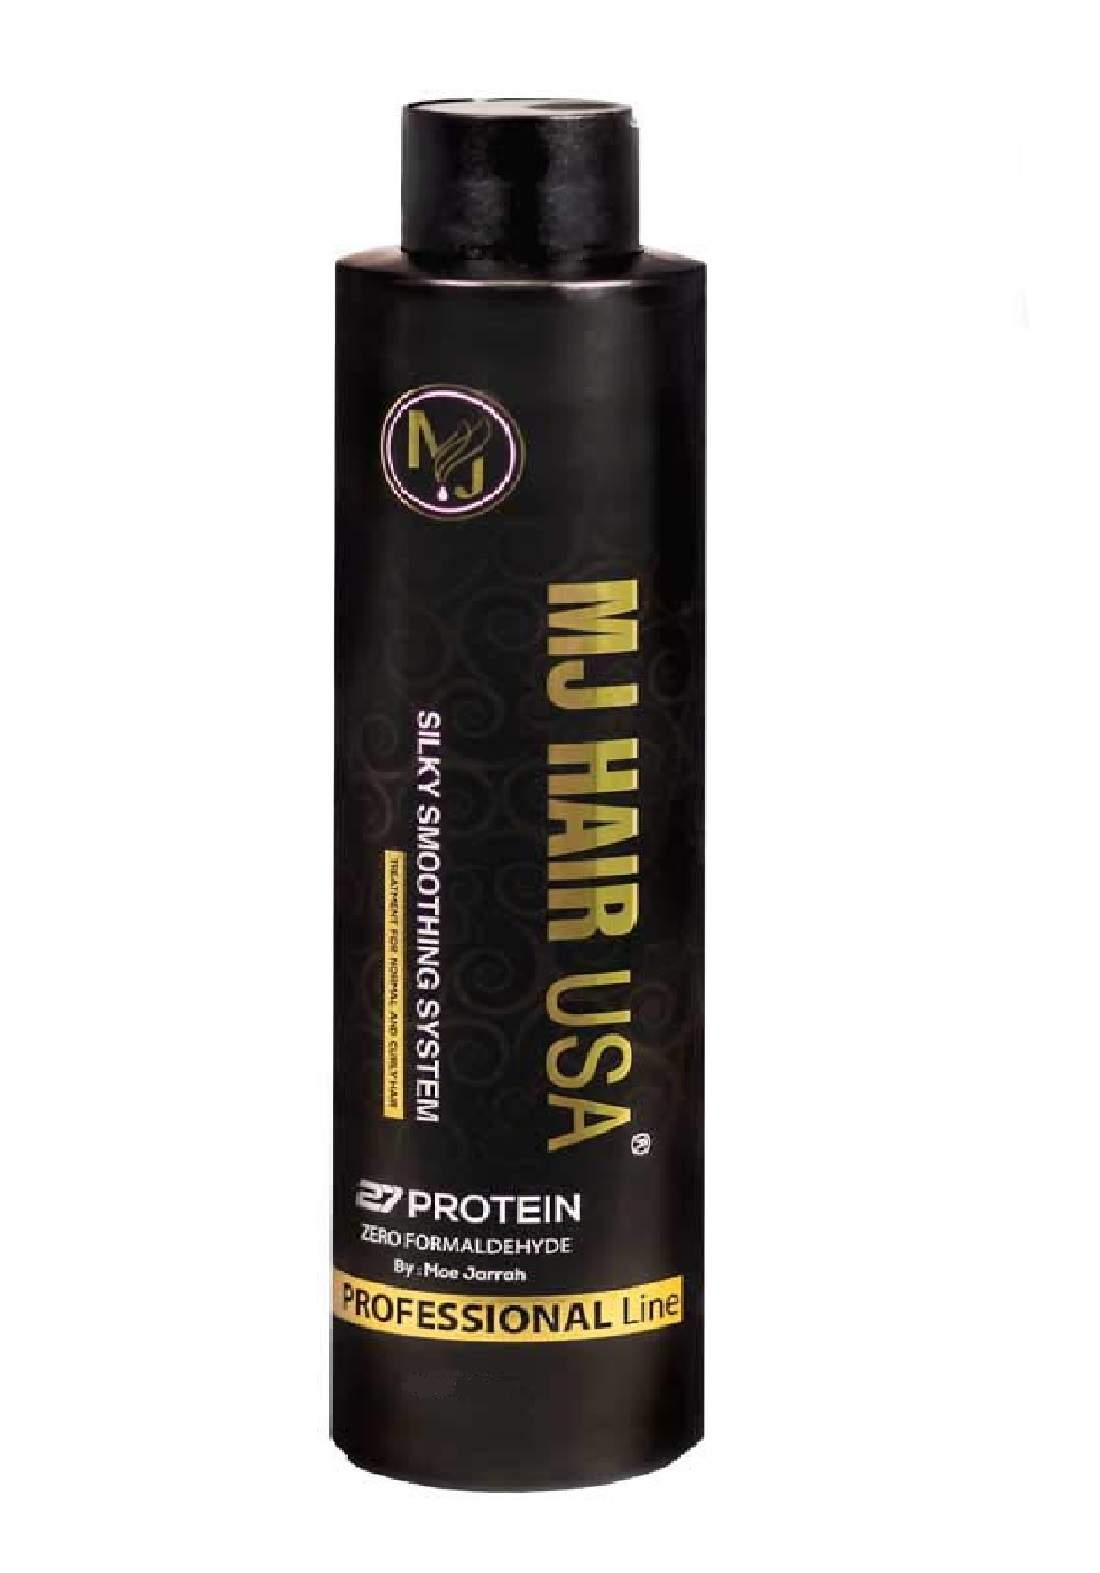 MJ Hair Silky Smoothing System 27 Protein Zero Formaldehyde 120ml  مسرح للشعر